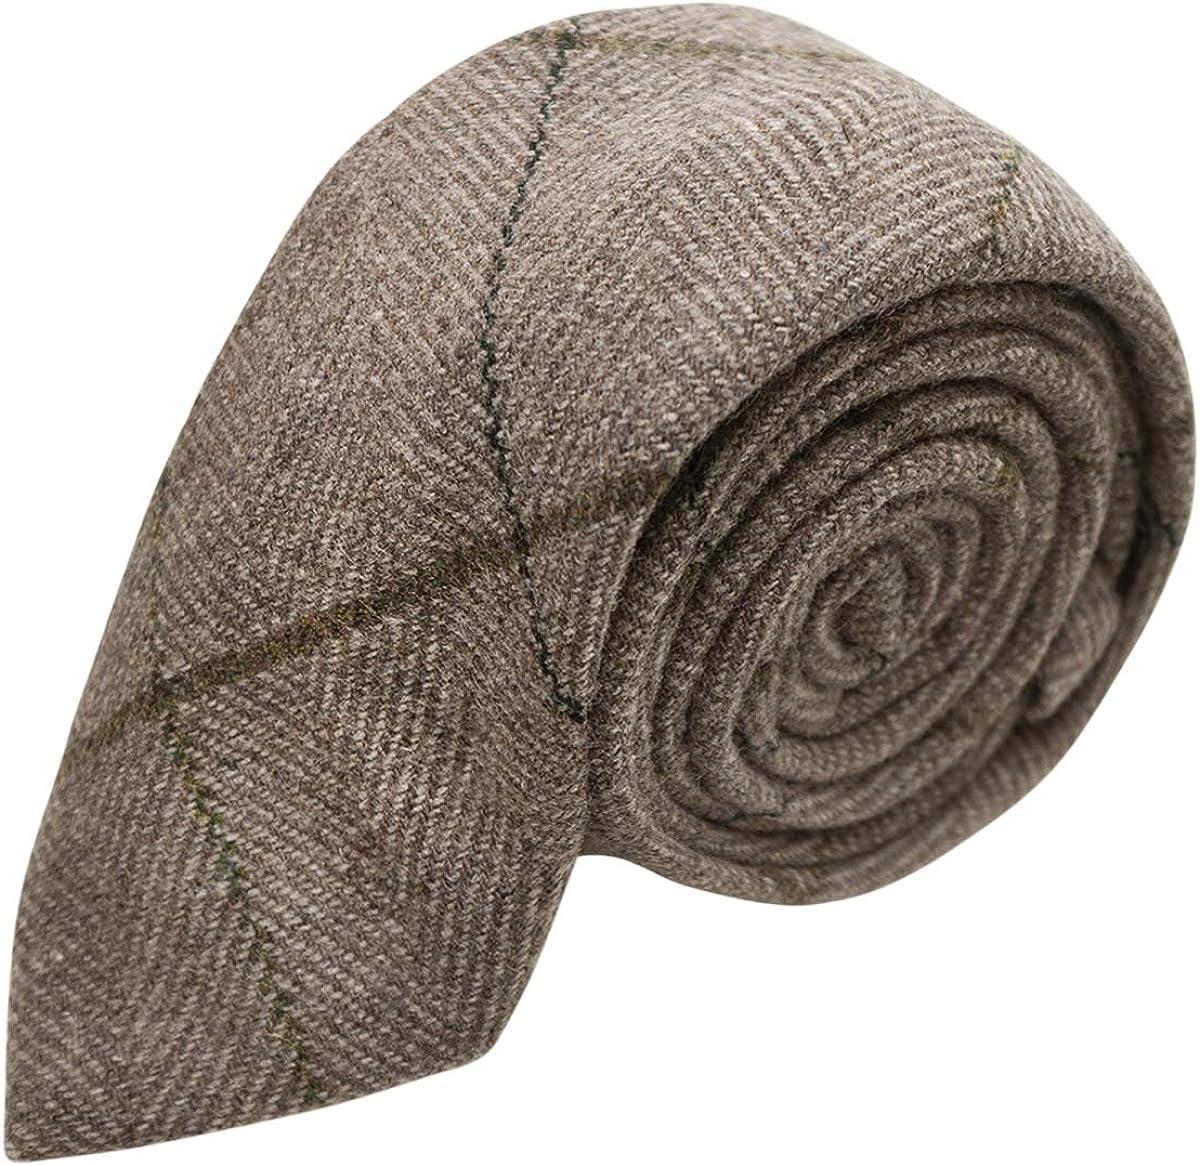 Luxury Light Khaki Brown Herringbone Check Necktie, Tweed